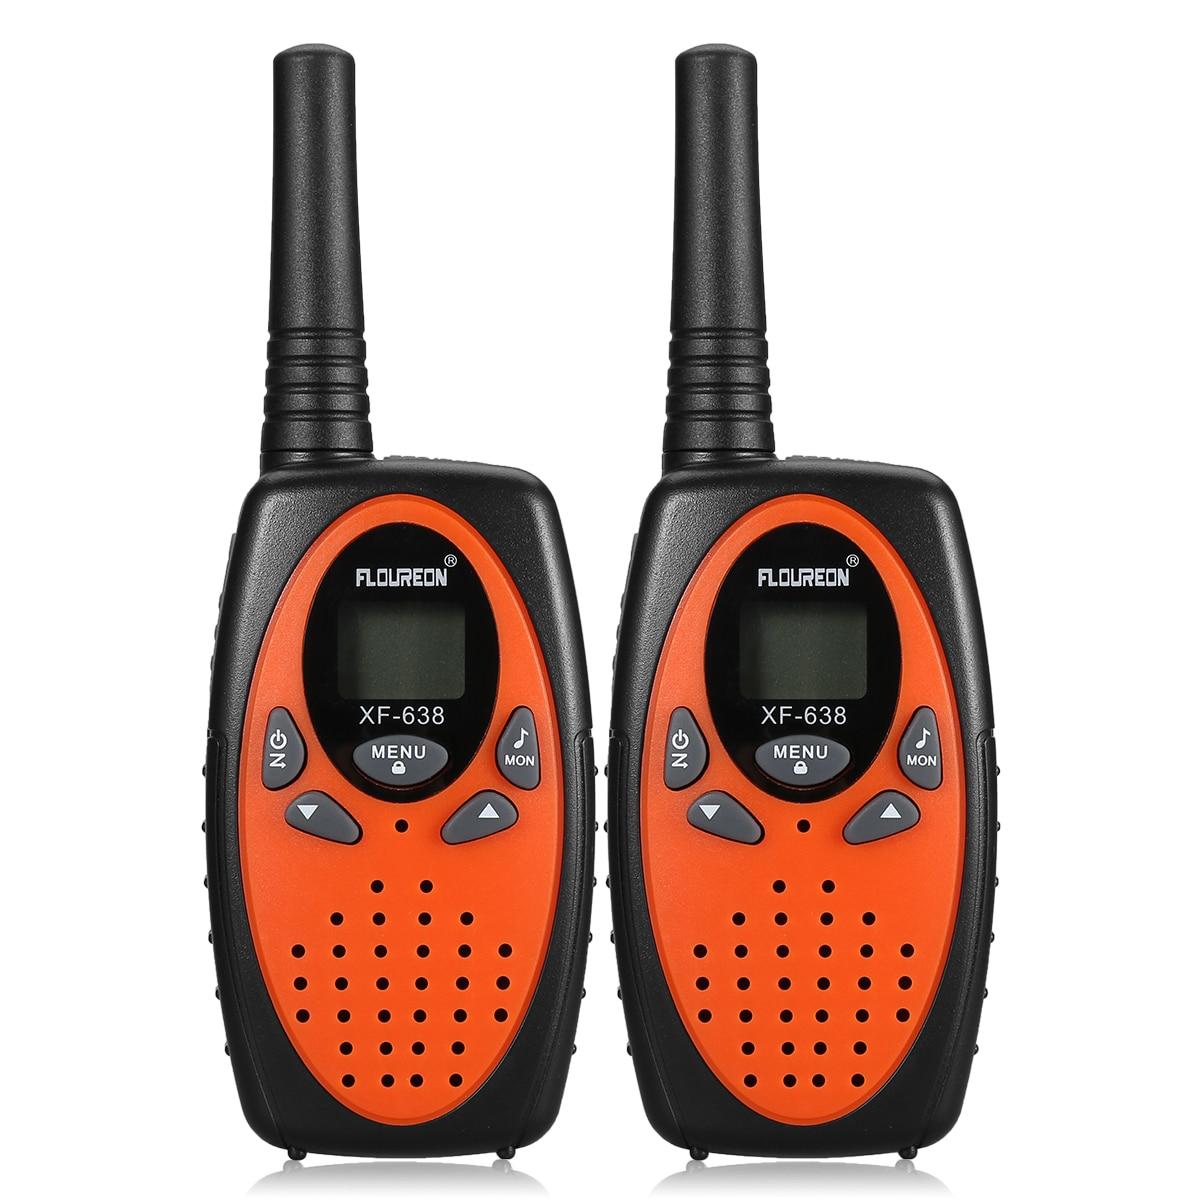 2pcs FLOUREON 8 Channel Kids Walkie Talkies PMR 446MHZ UHF400-470MHz TWO-Way Radio 3KM Portable Interphone VOX Communicator Gift